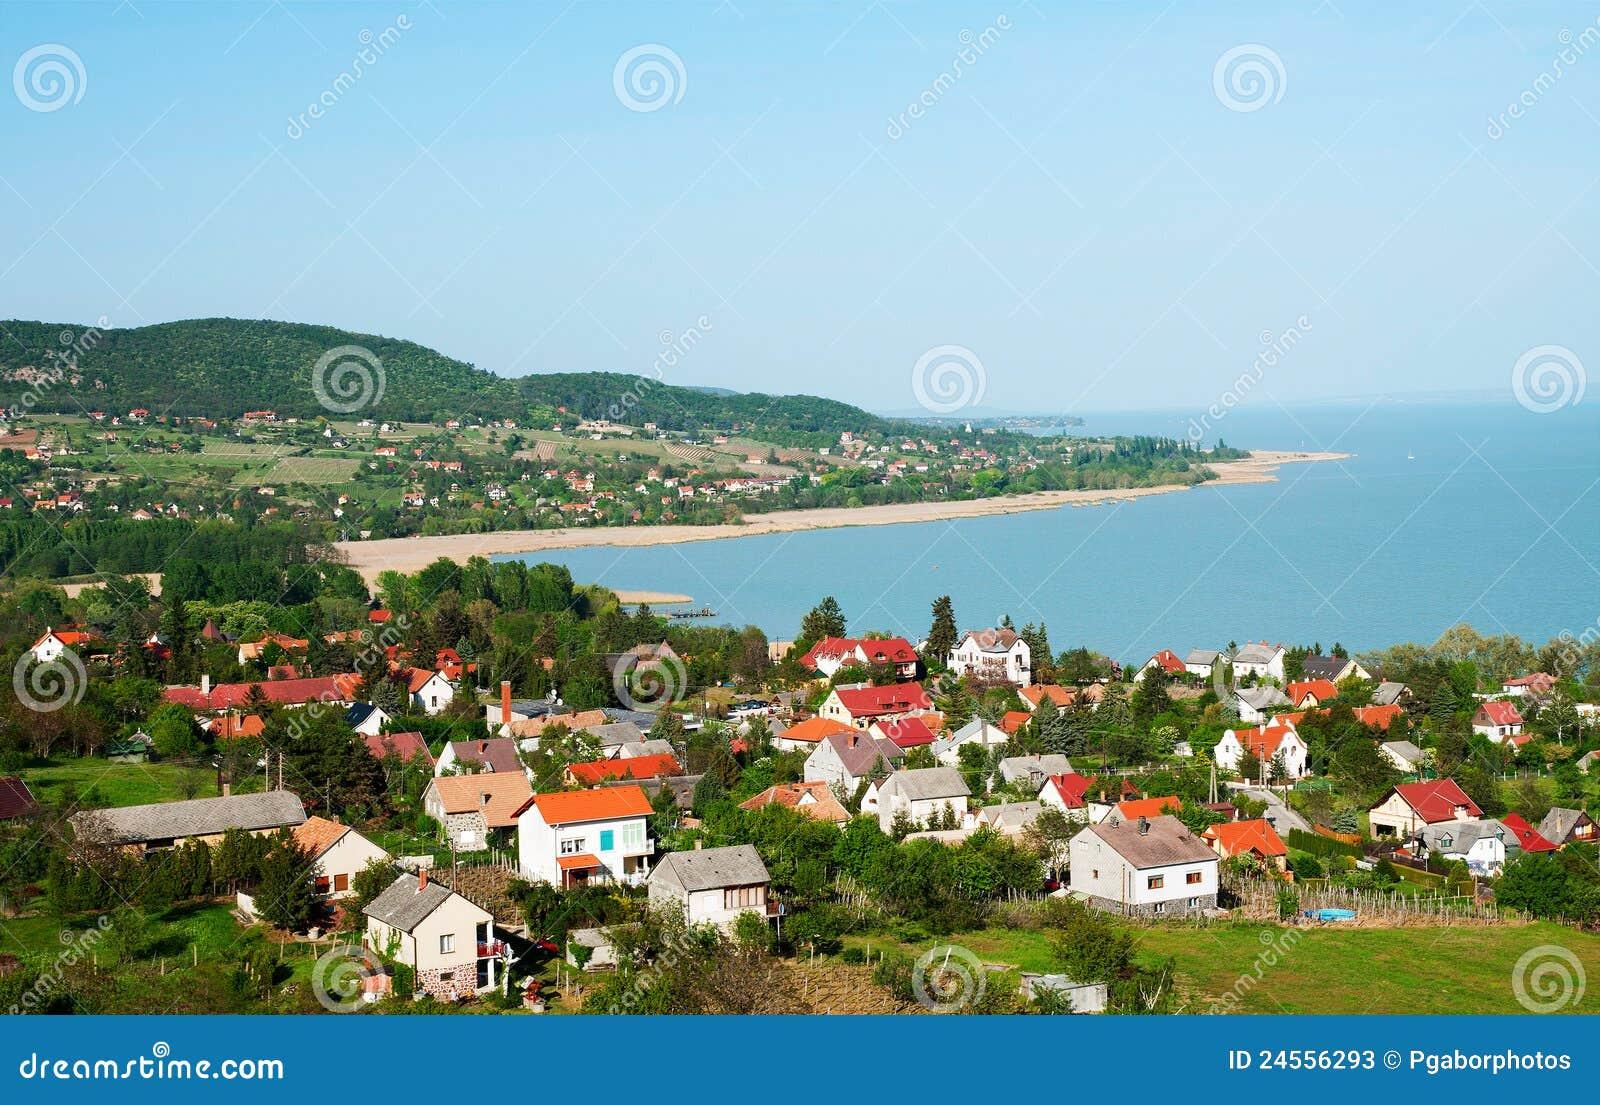 Little village at Lake Balaton